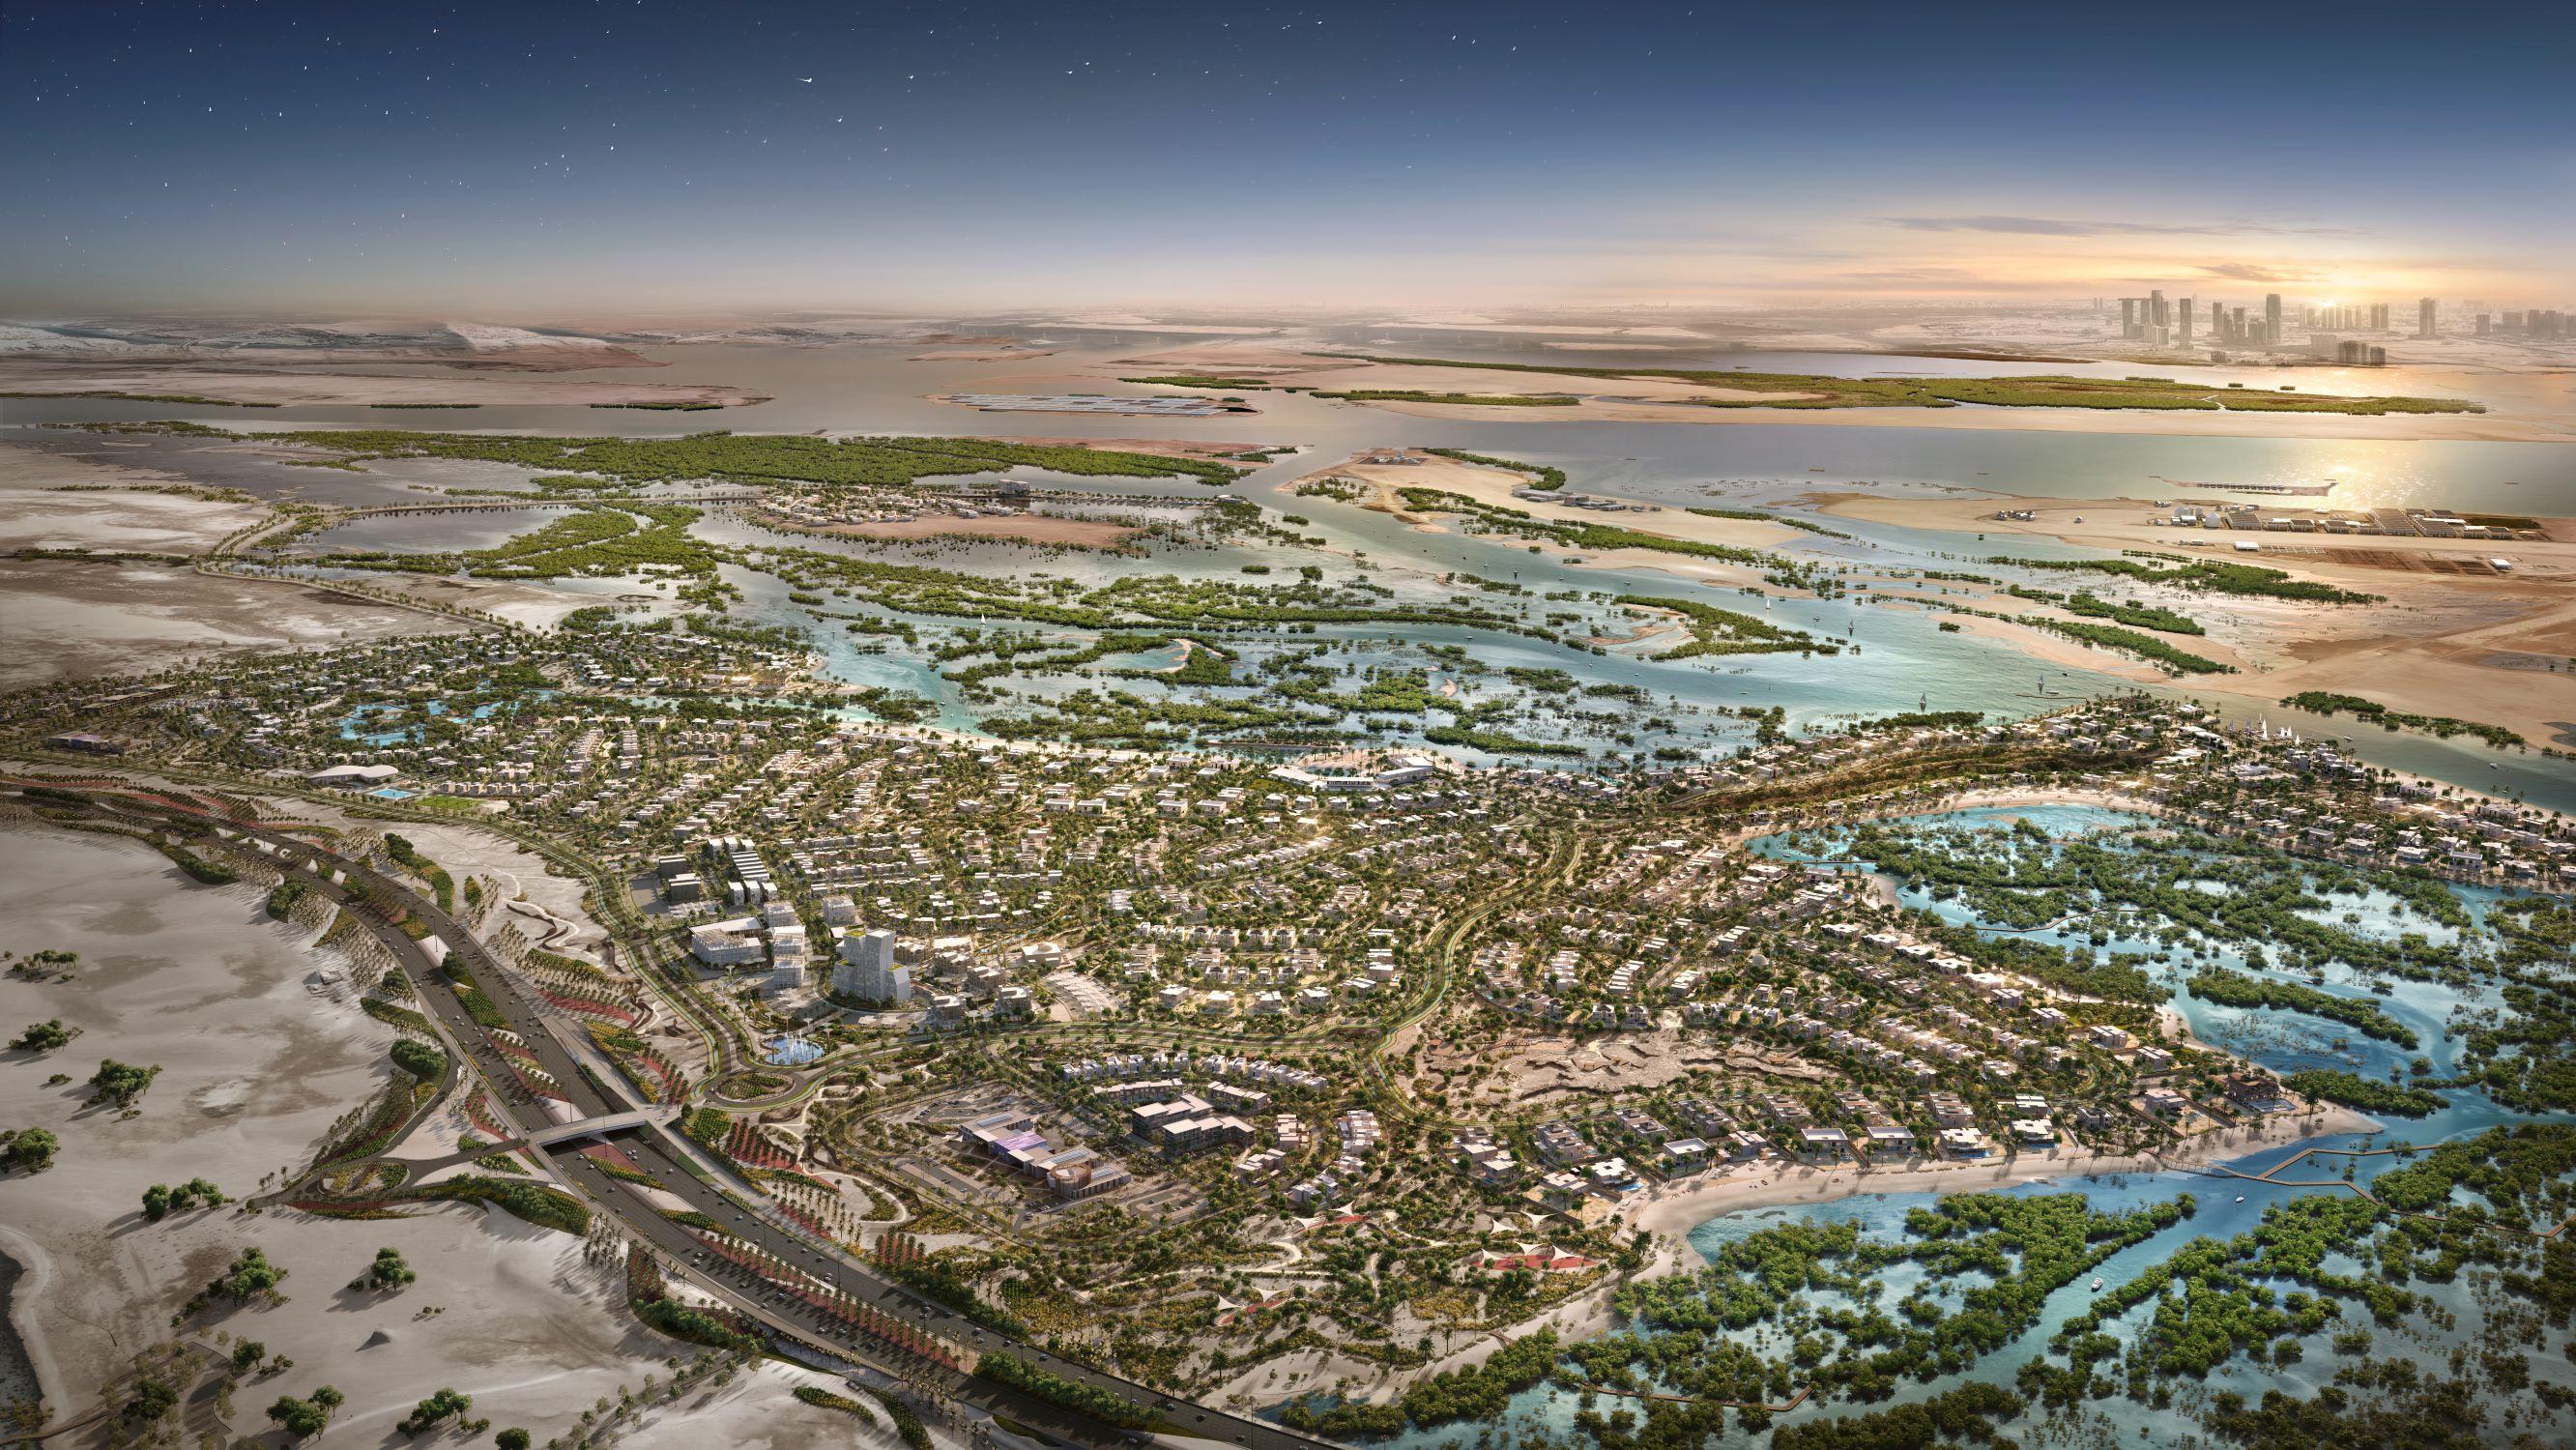 aed5 billion jubail island launched in abu dhabi  2